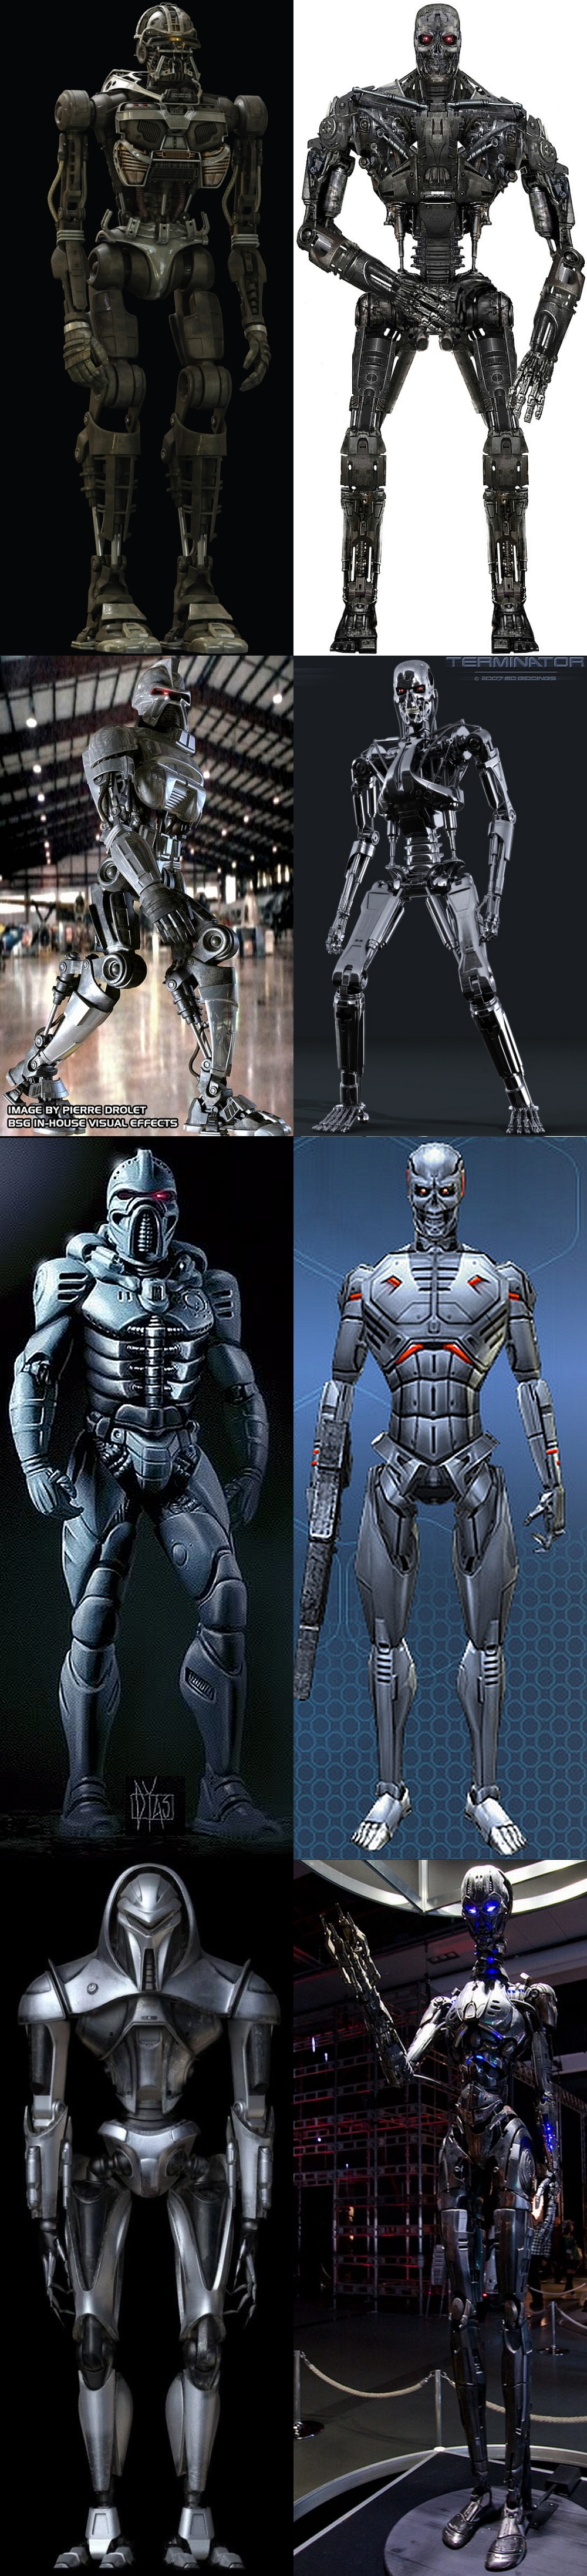 Terminator Salvation BehindtheScenes T600 Puppet Test